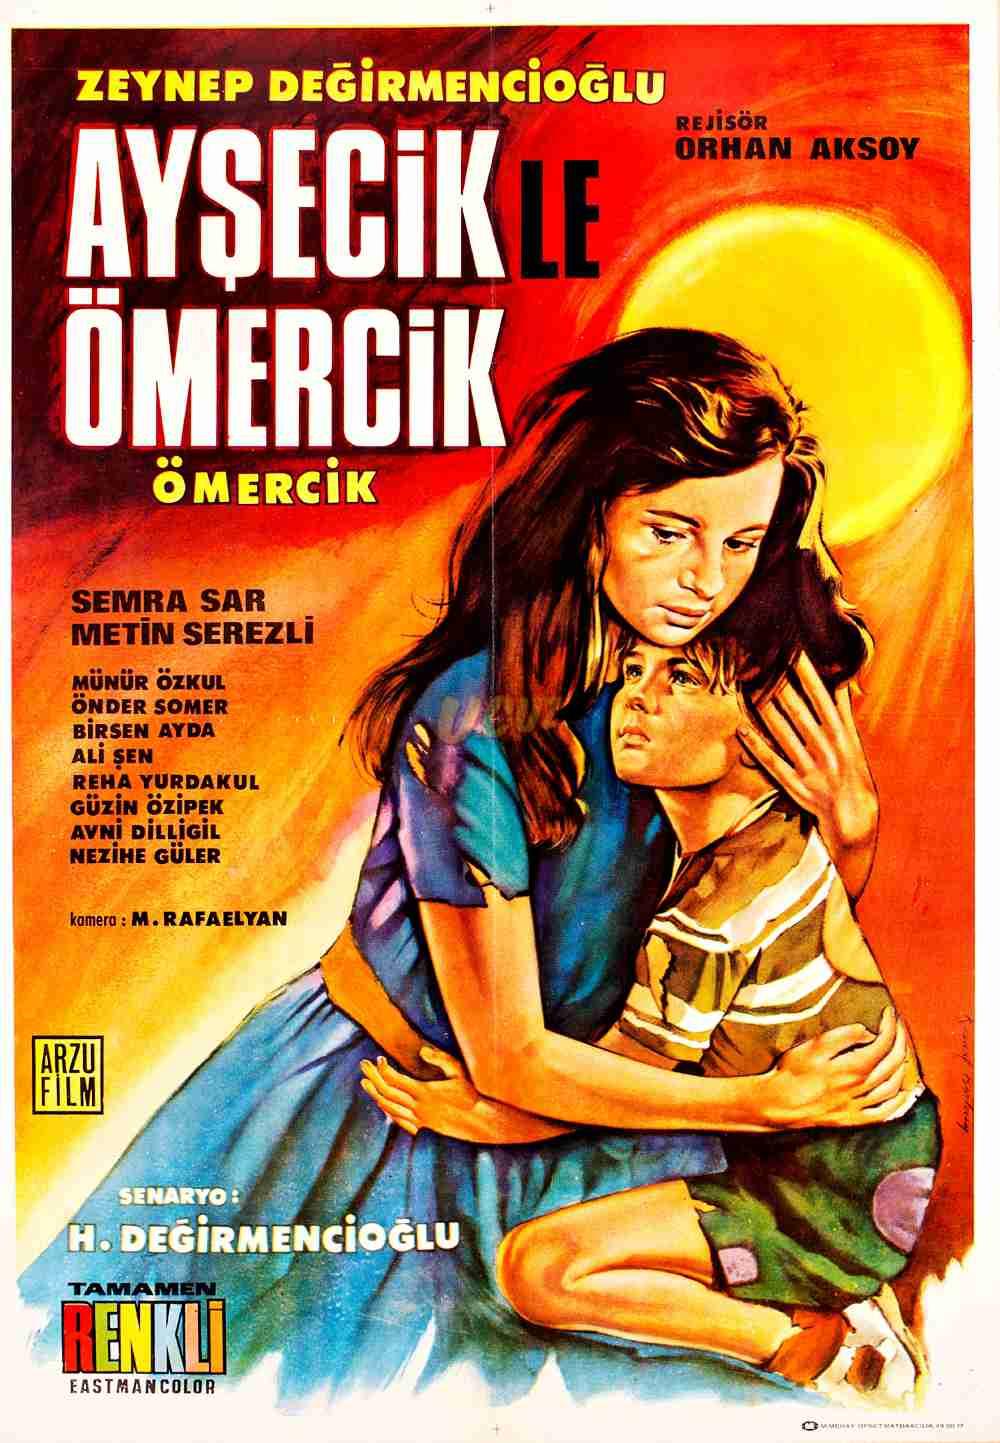 aysecikle_omercik_1969-3